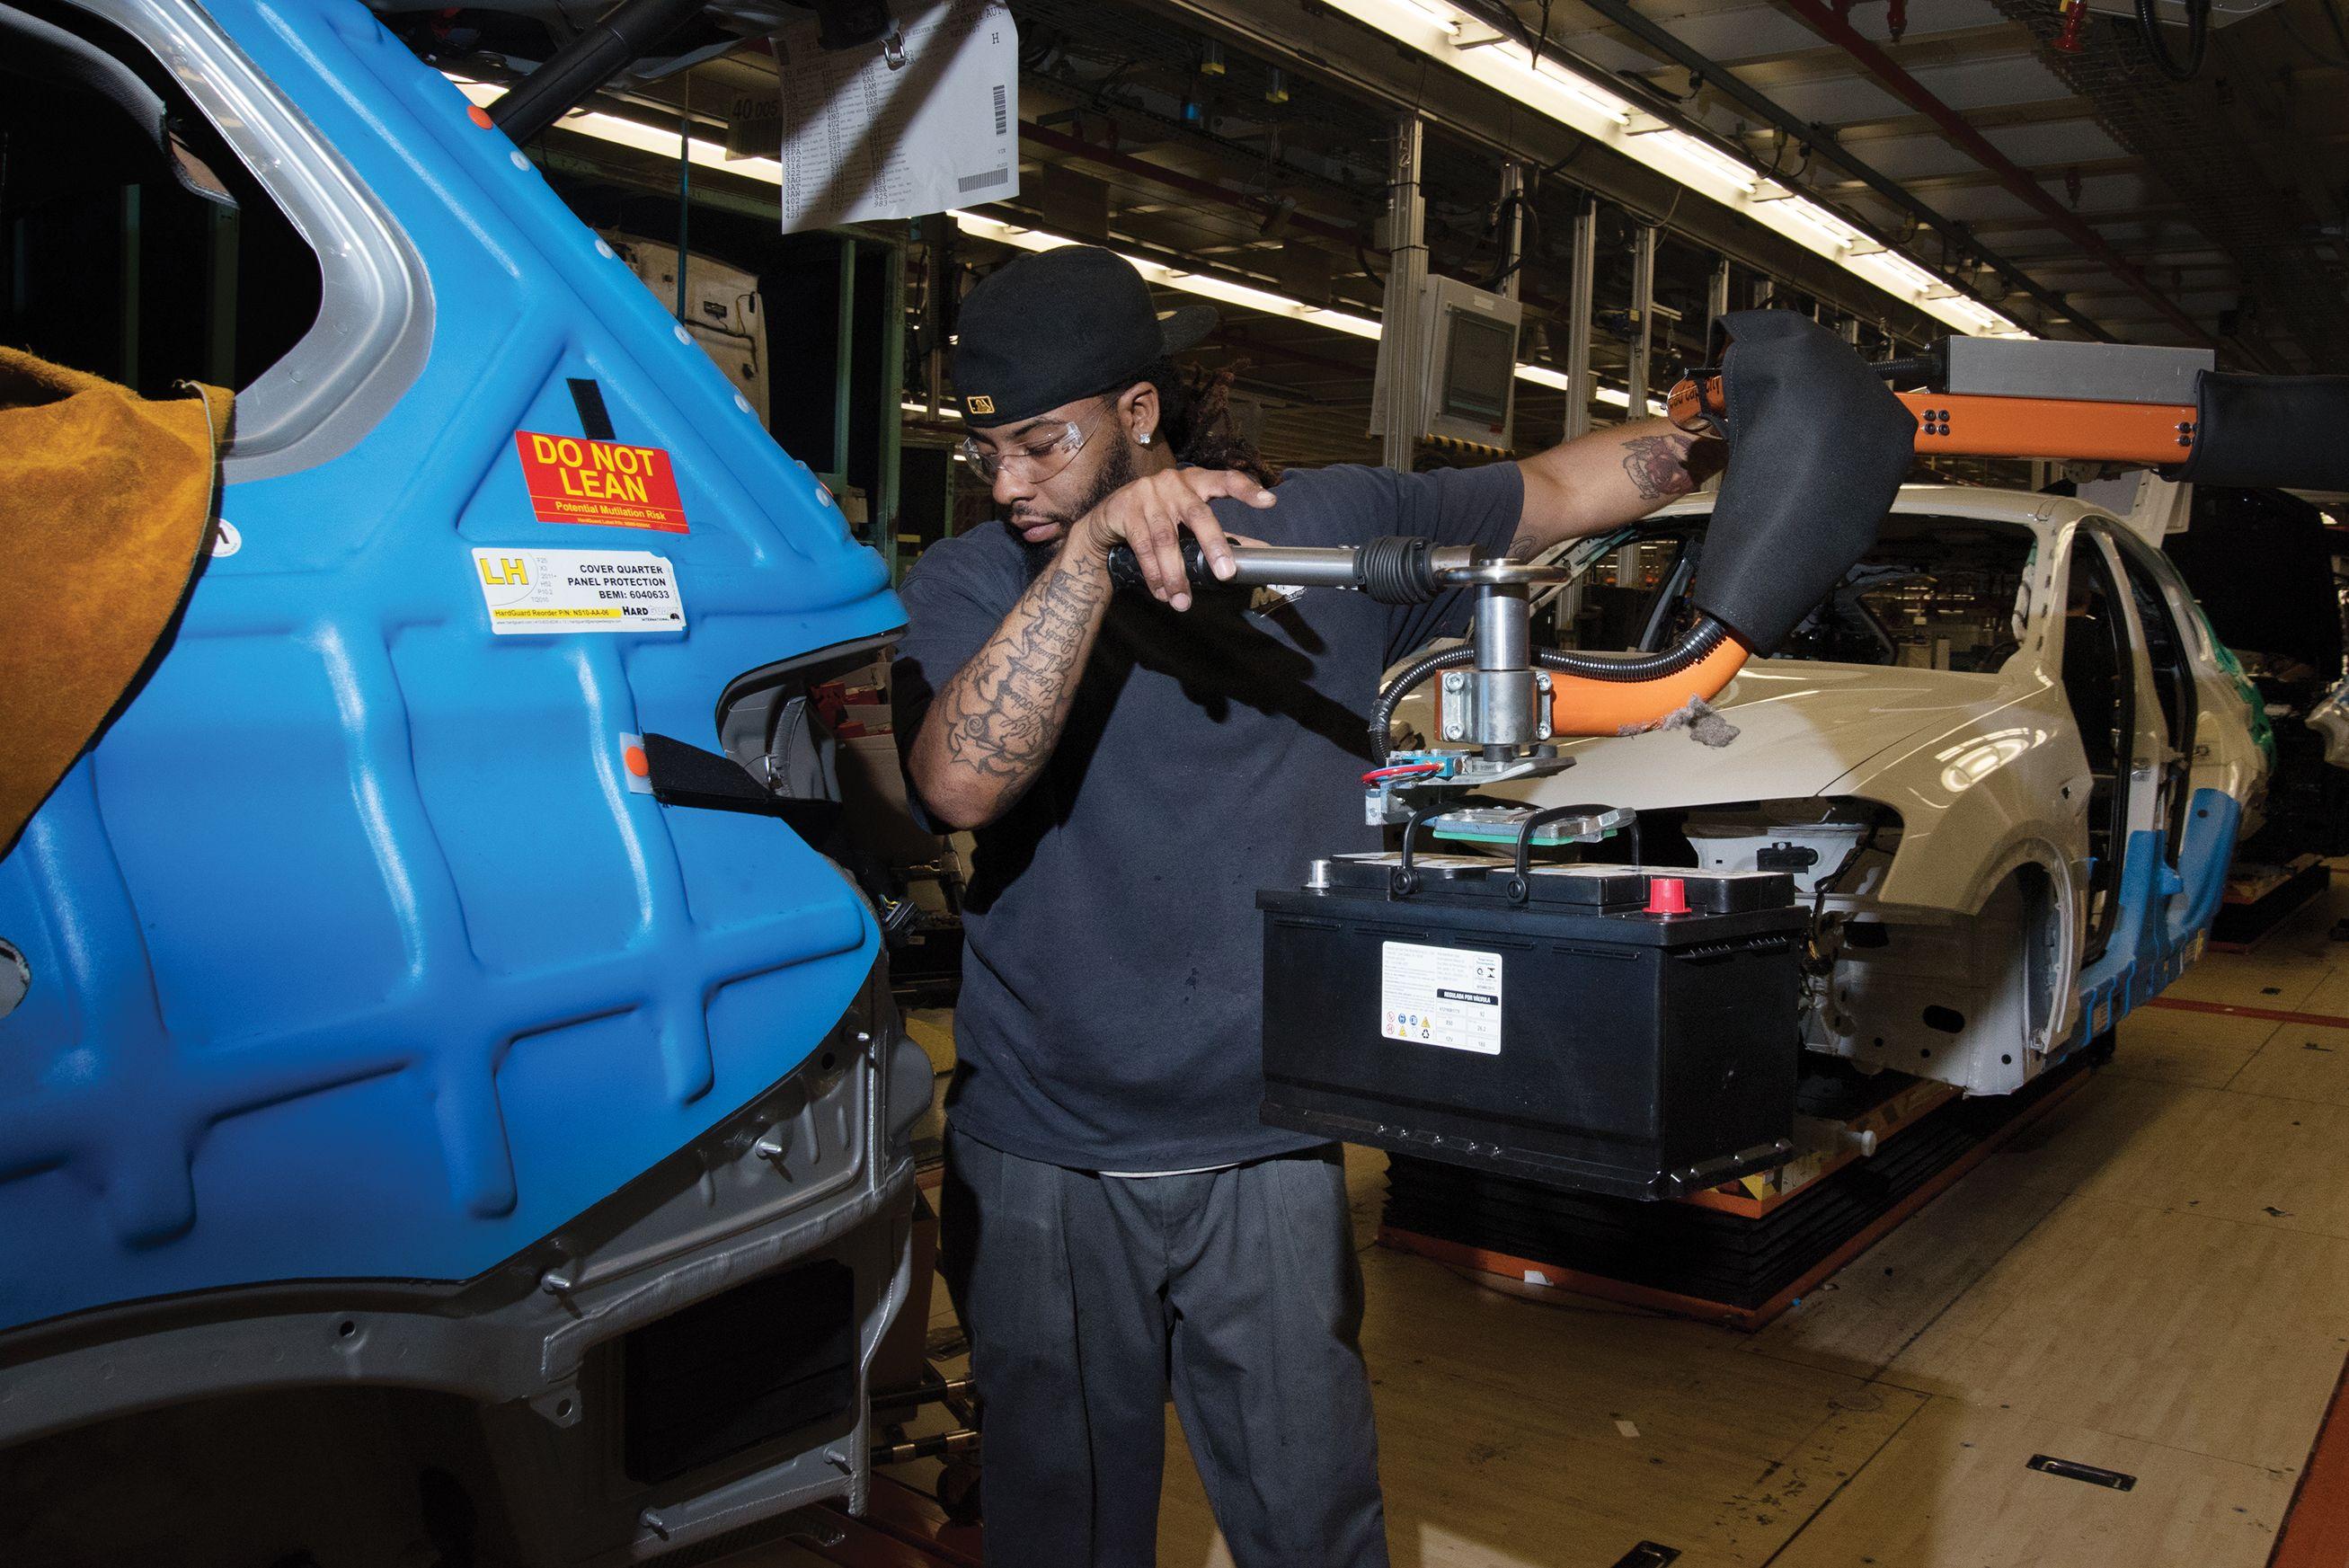 Assembling cars at BMW's factory in Greer, South Carolina.